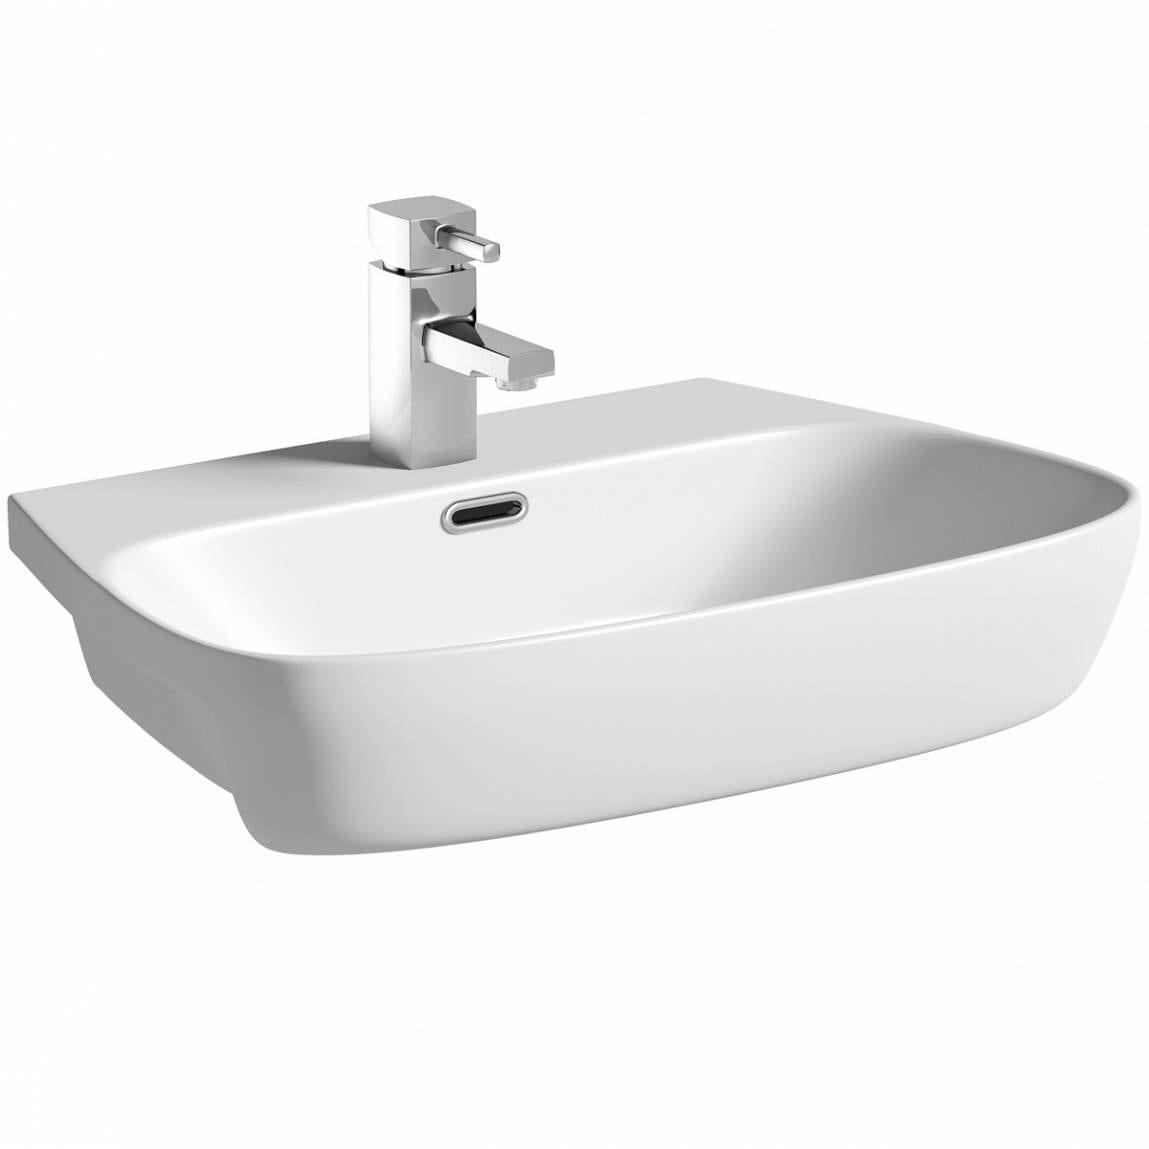 Foster 1 tap hole semi recessed countertop basin 600mm